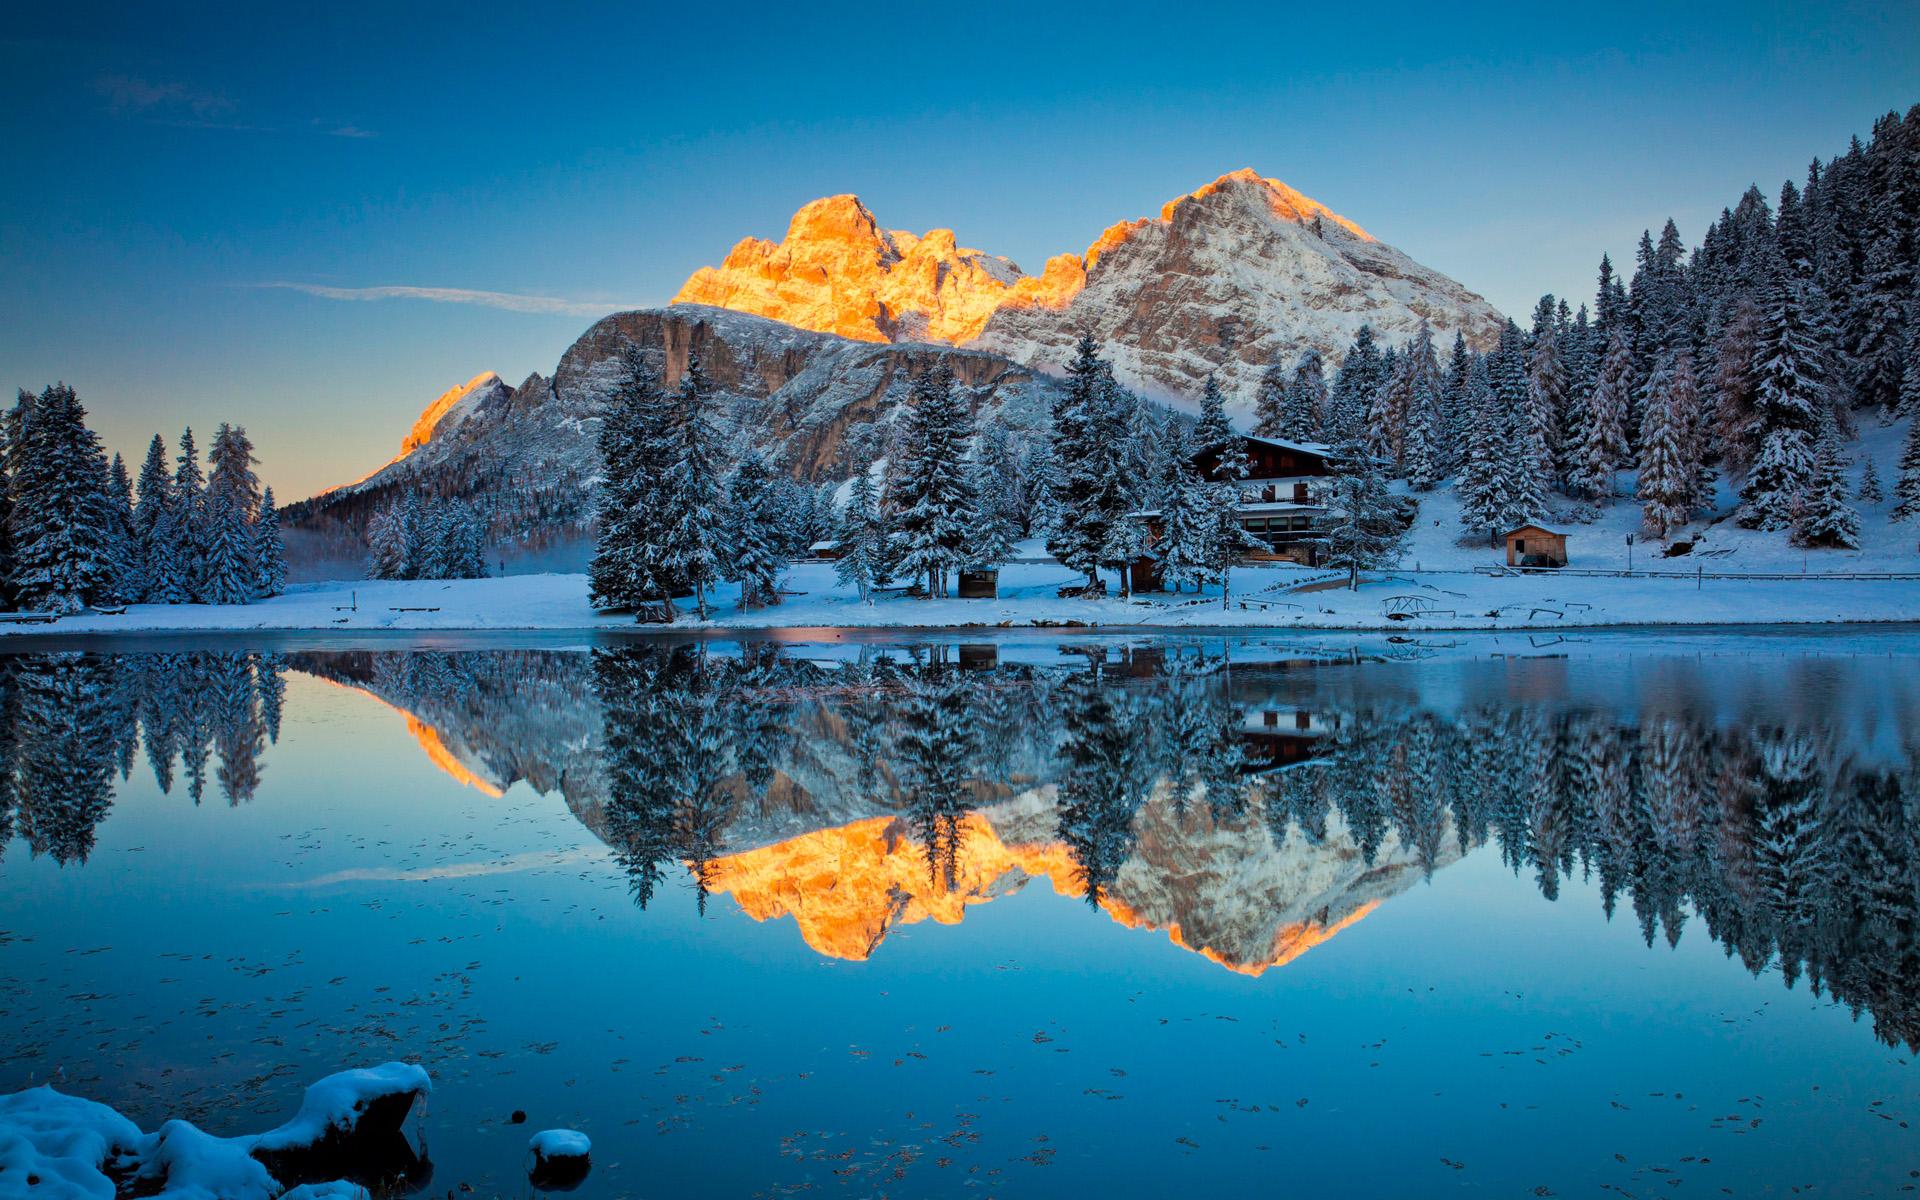 HD Wallpapers Lake Misurina Reflections